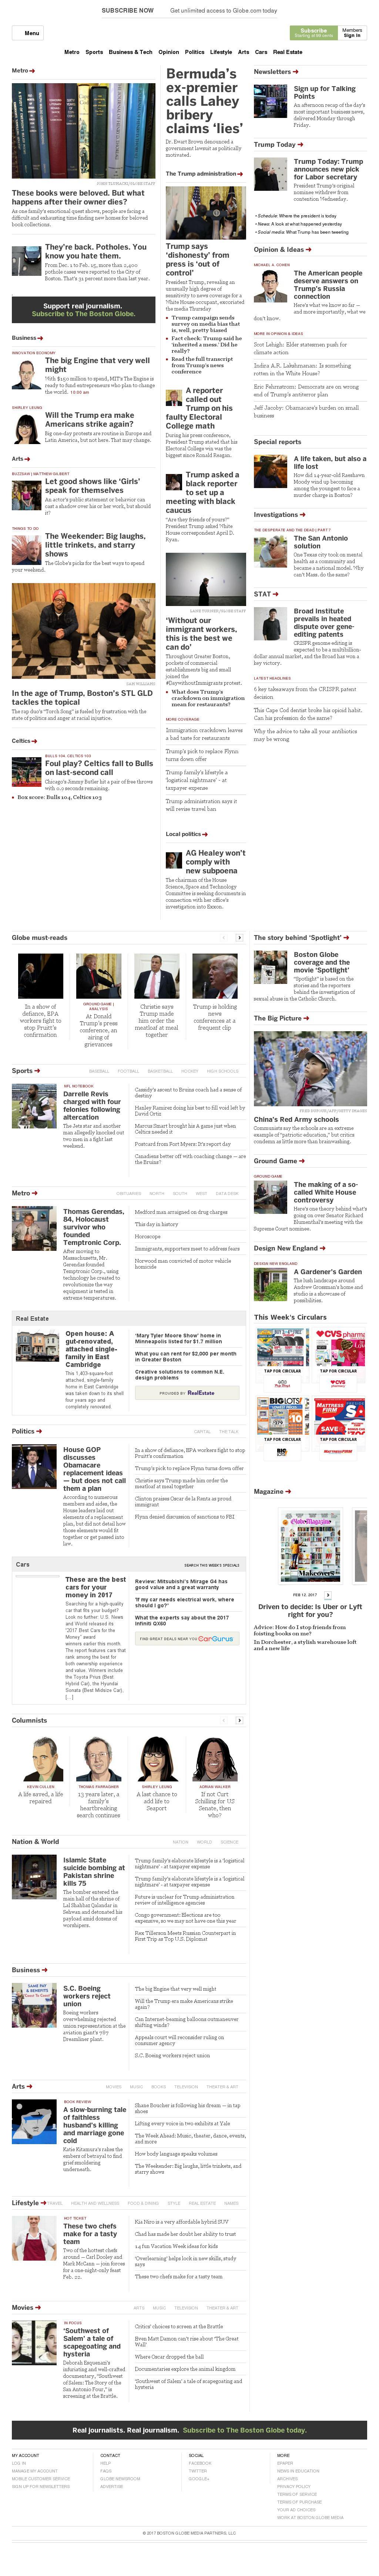 The Boston Globe at Friday Feb. 17, 2017, noon UTC